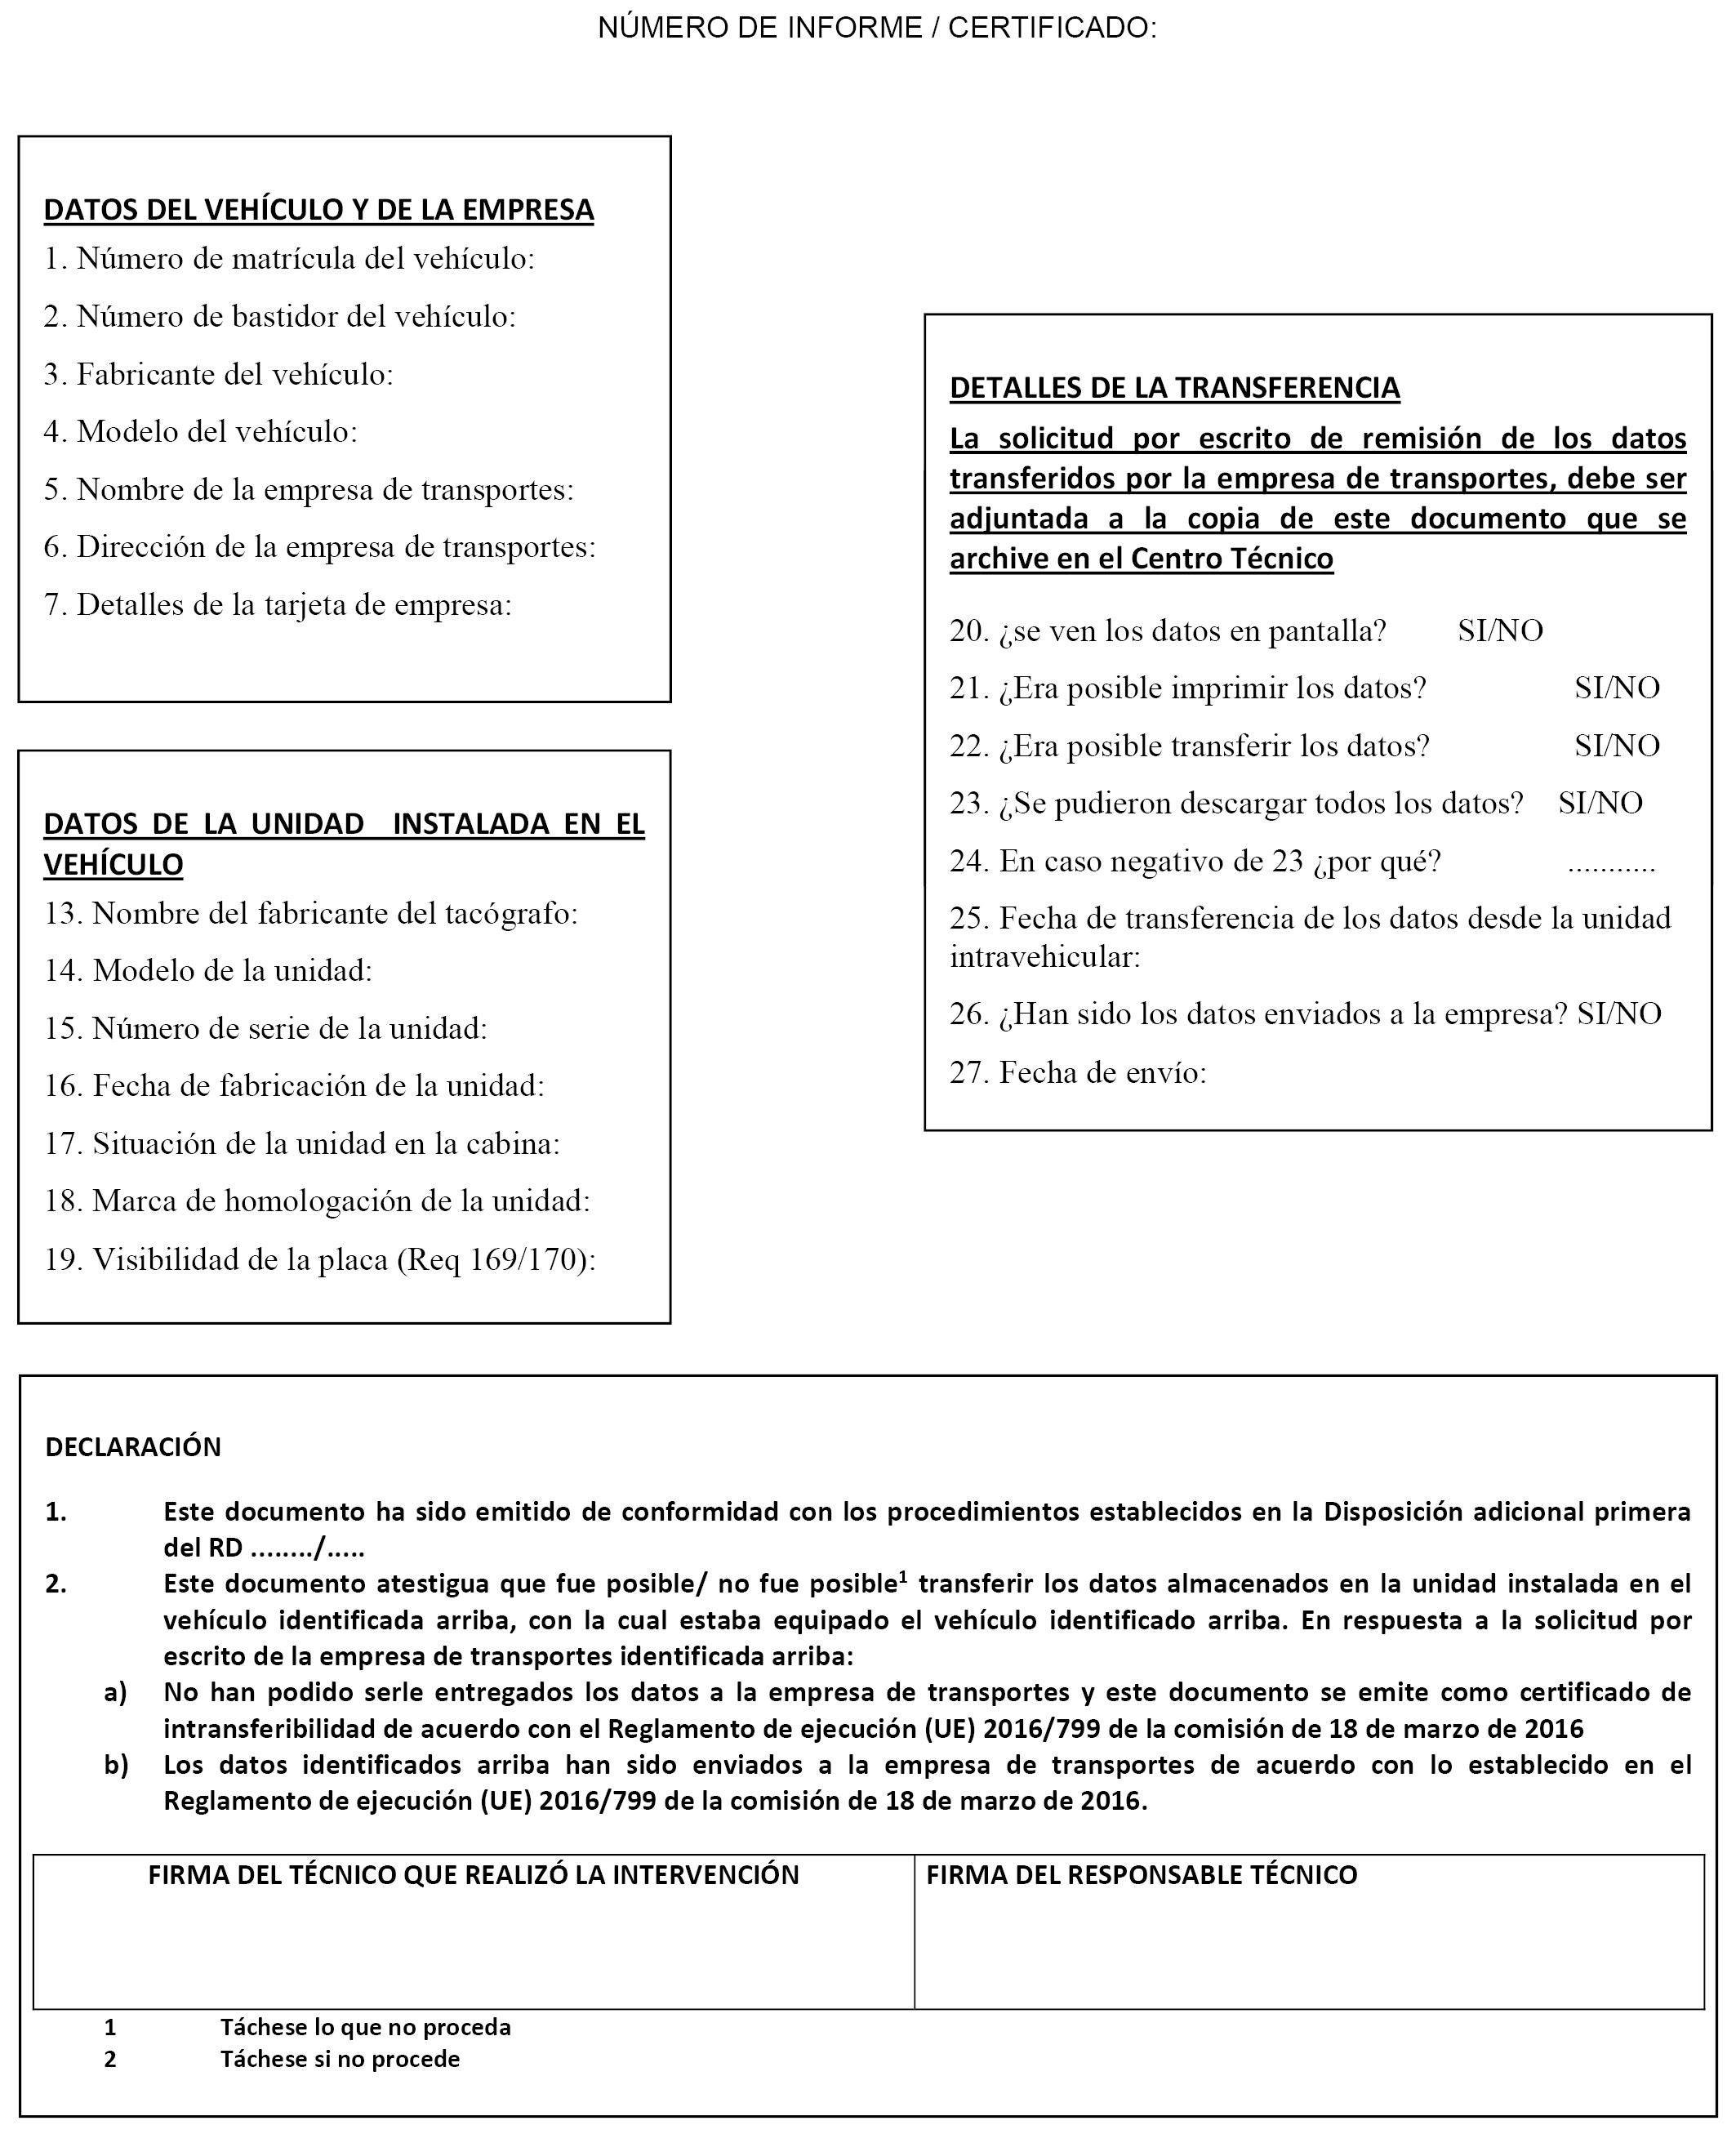 BOE.es - Documento BOE-A-2017-1935